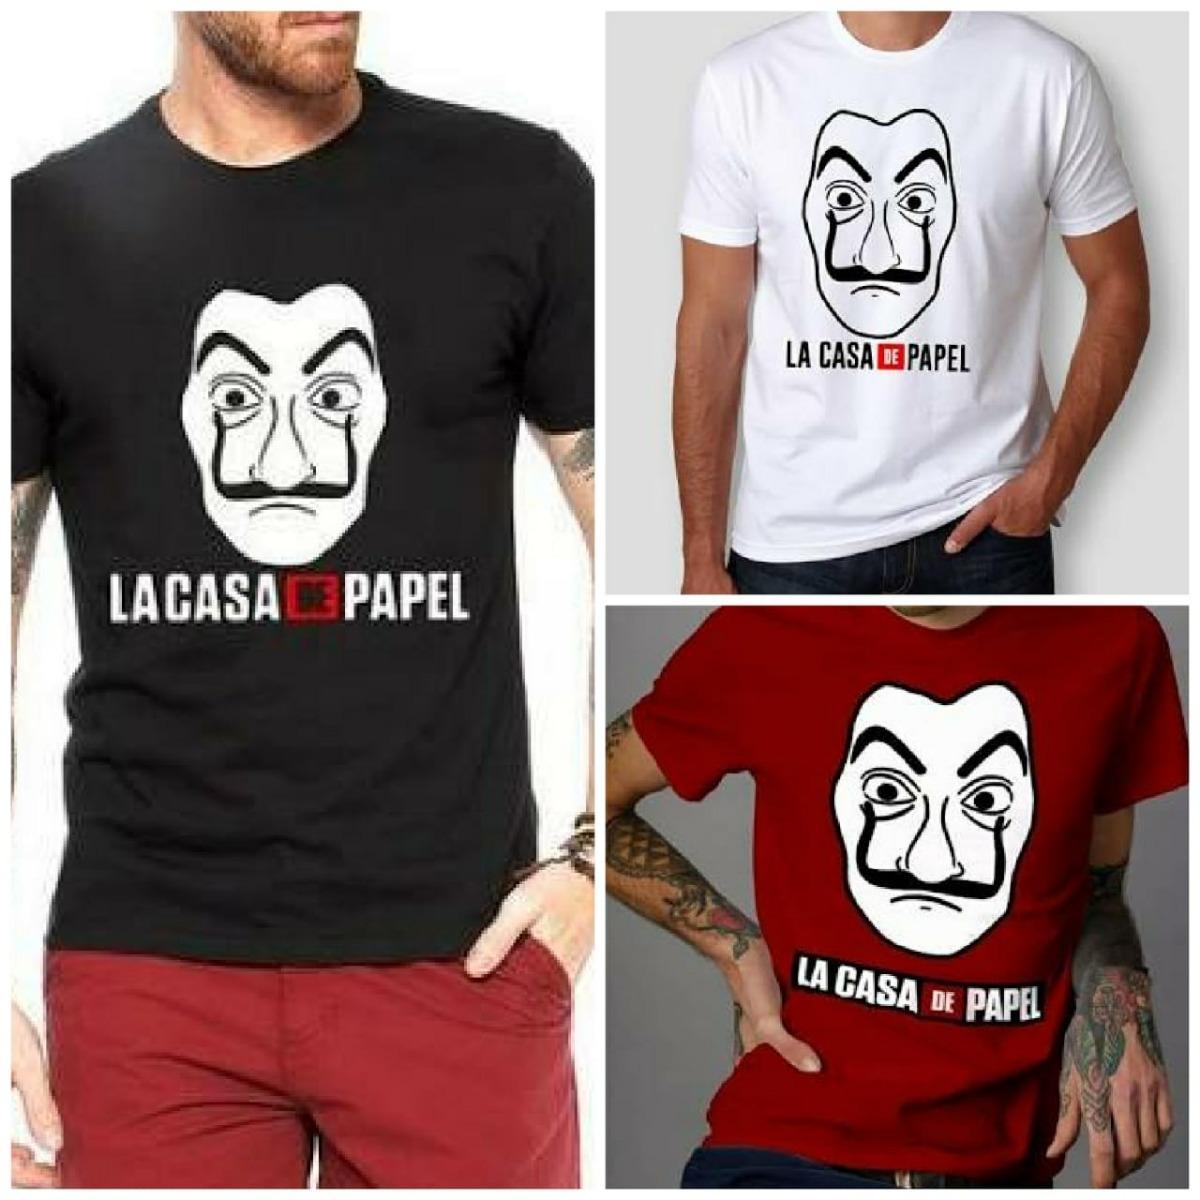 Kit 3 Camisas Camiseta La Casa De Papel Mascara Frete Gratis - R ... 638c5df05dd30